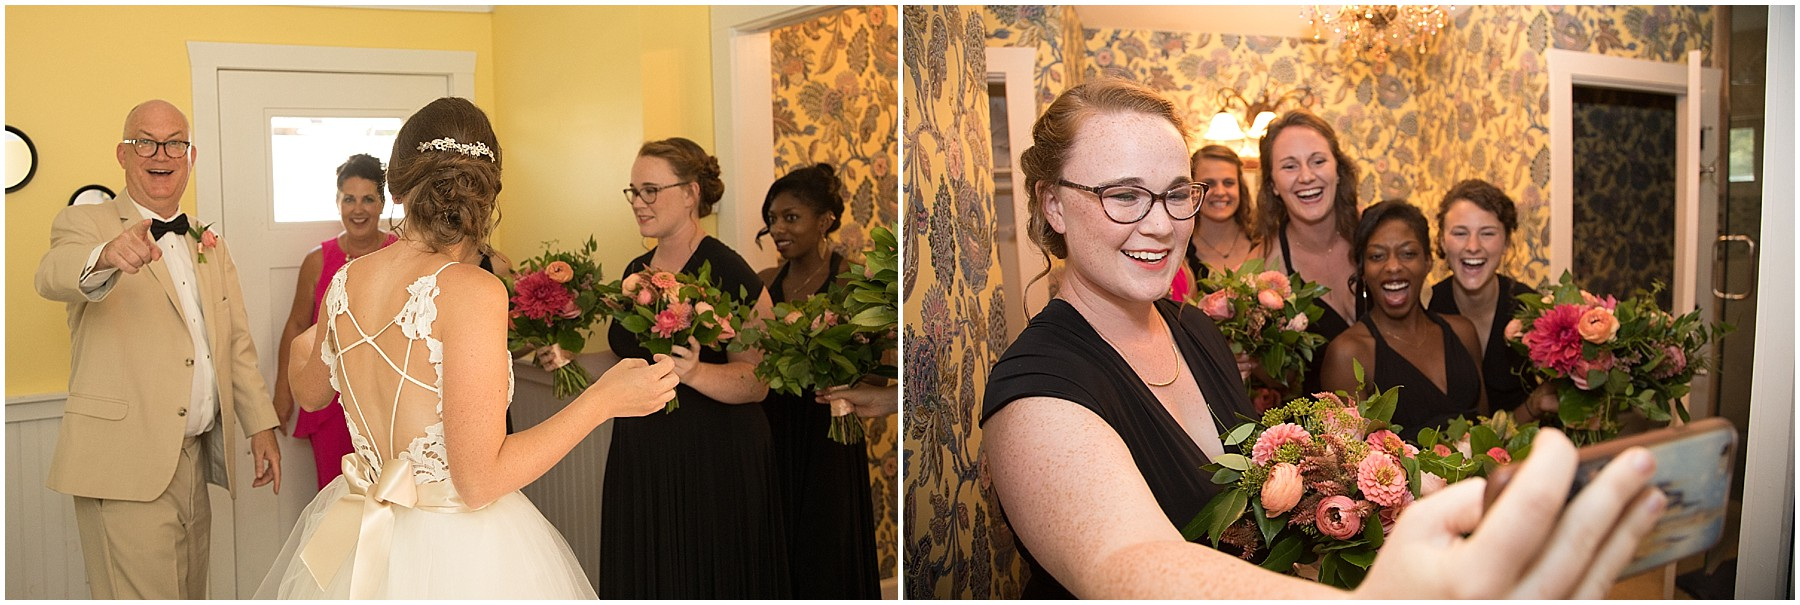 JoLo Winery Wedding Photographers